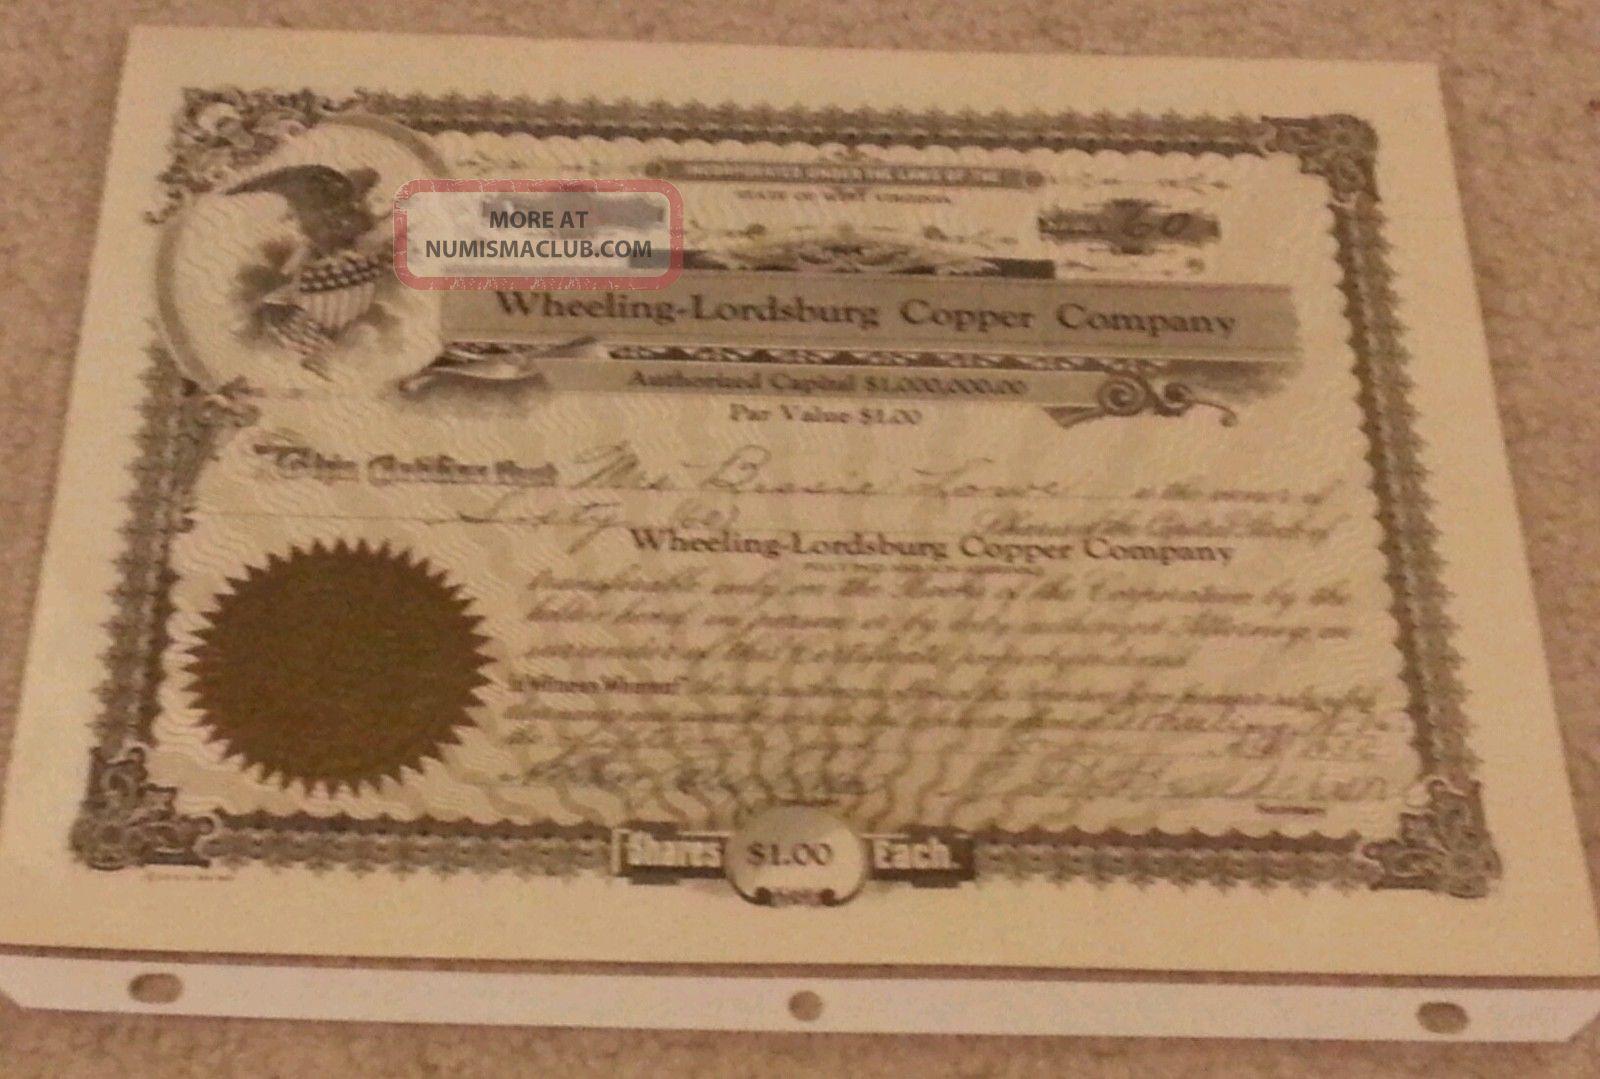 Wheeling - Lordsburg Copper Company Stock Certificate 1936 W/ Seal Wv Stocks & Bonds, Scripophily photo